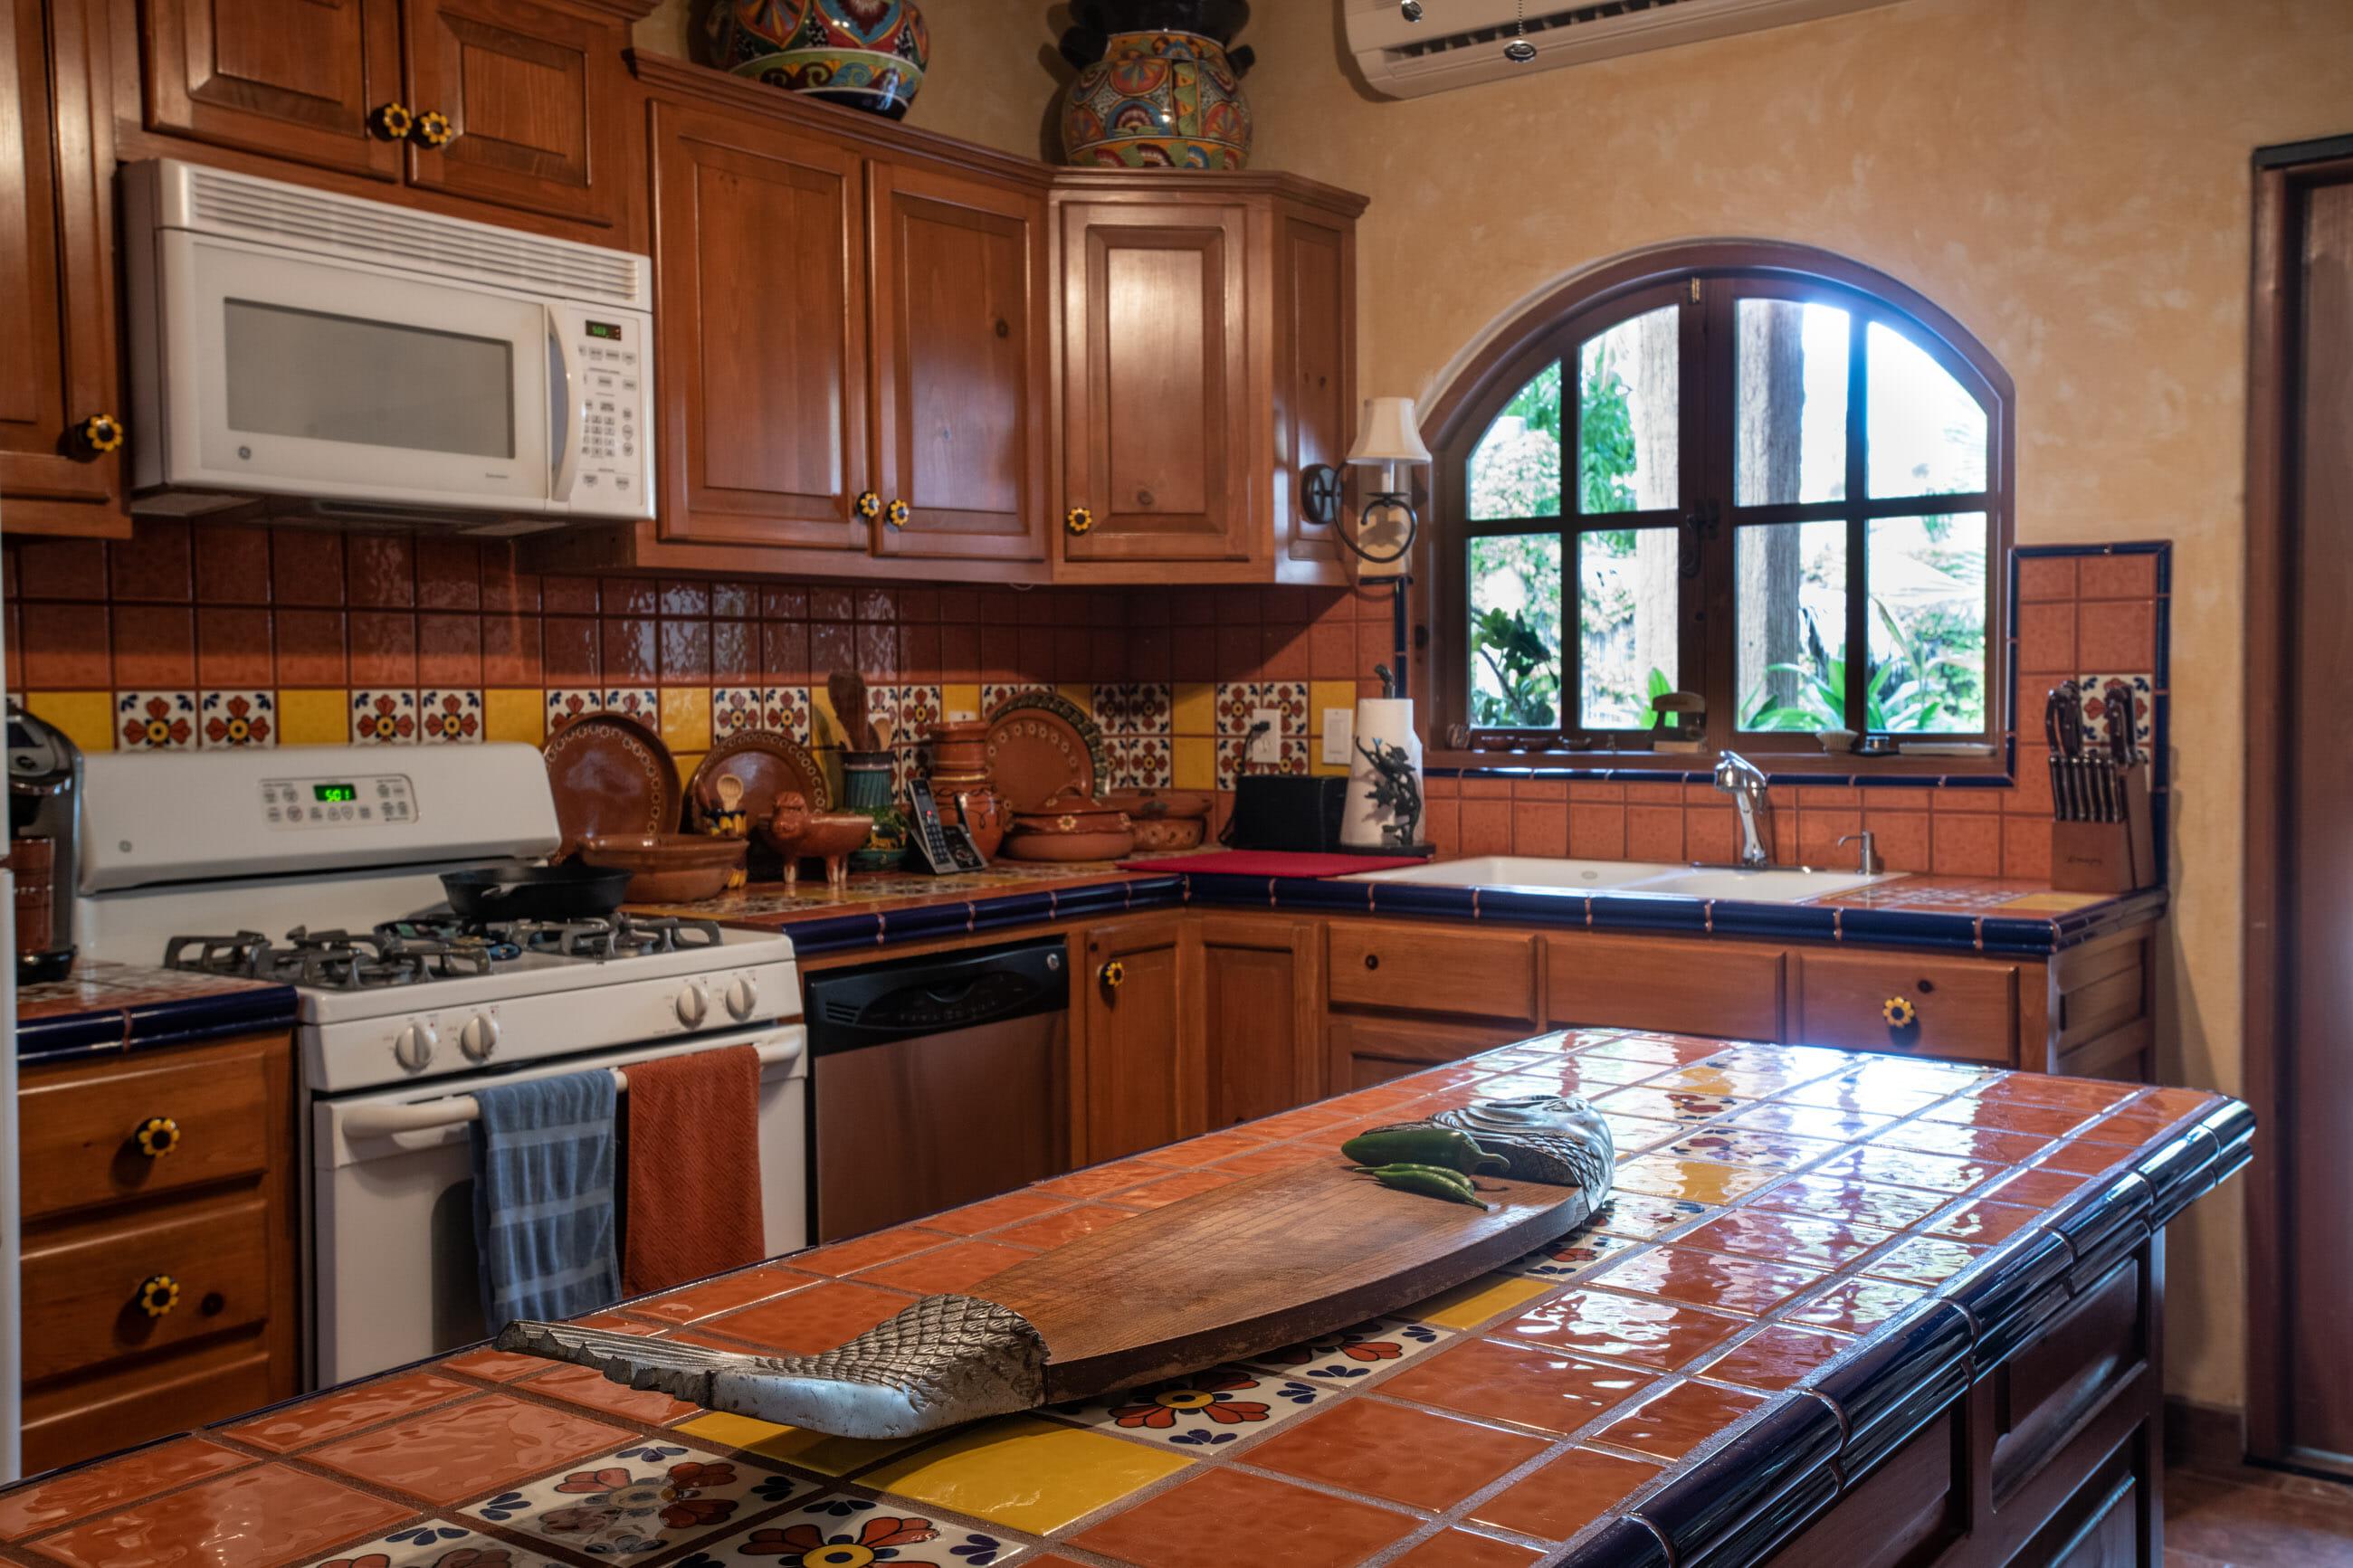 288 Davis St Loreto, Baja California Sur Mexico Kitchen island